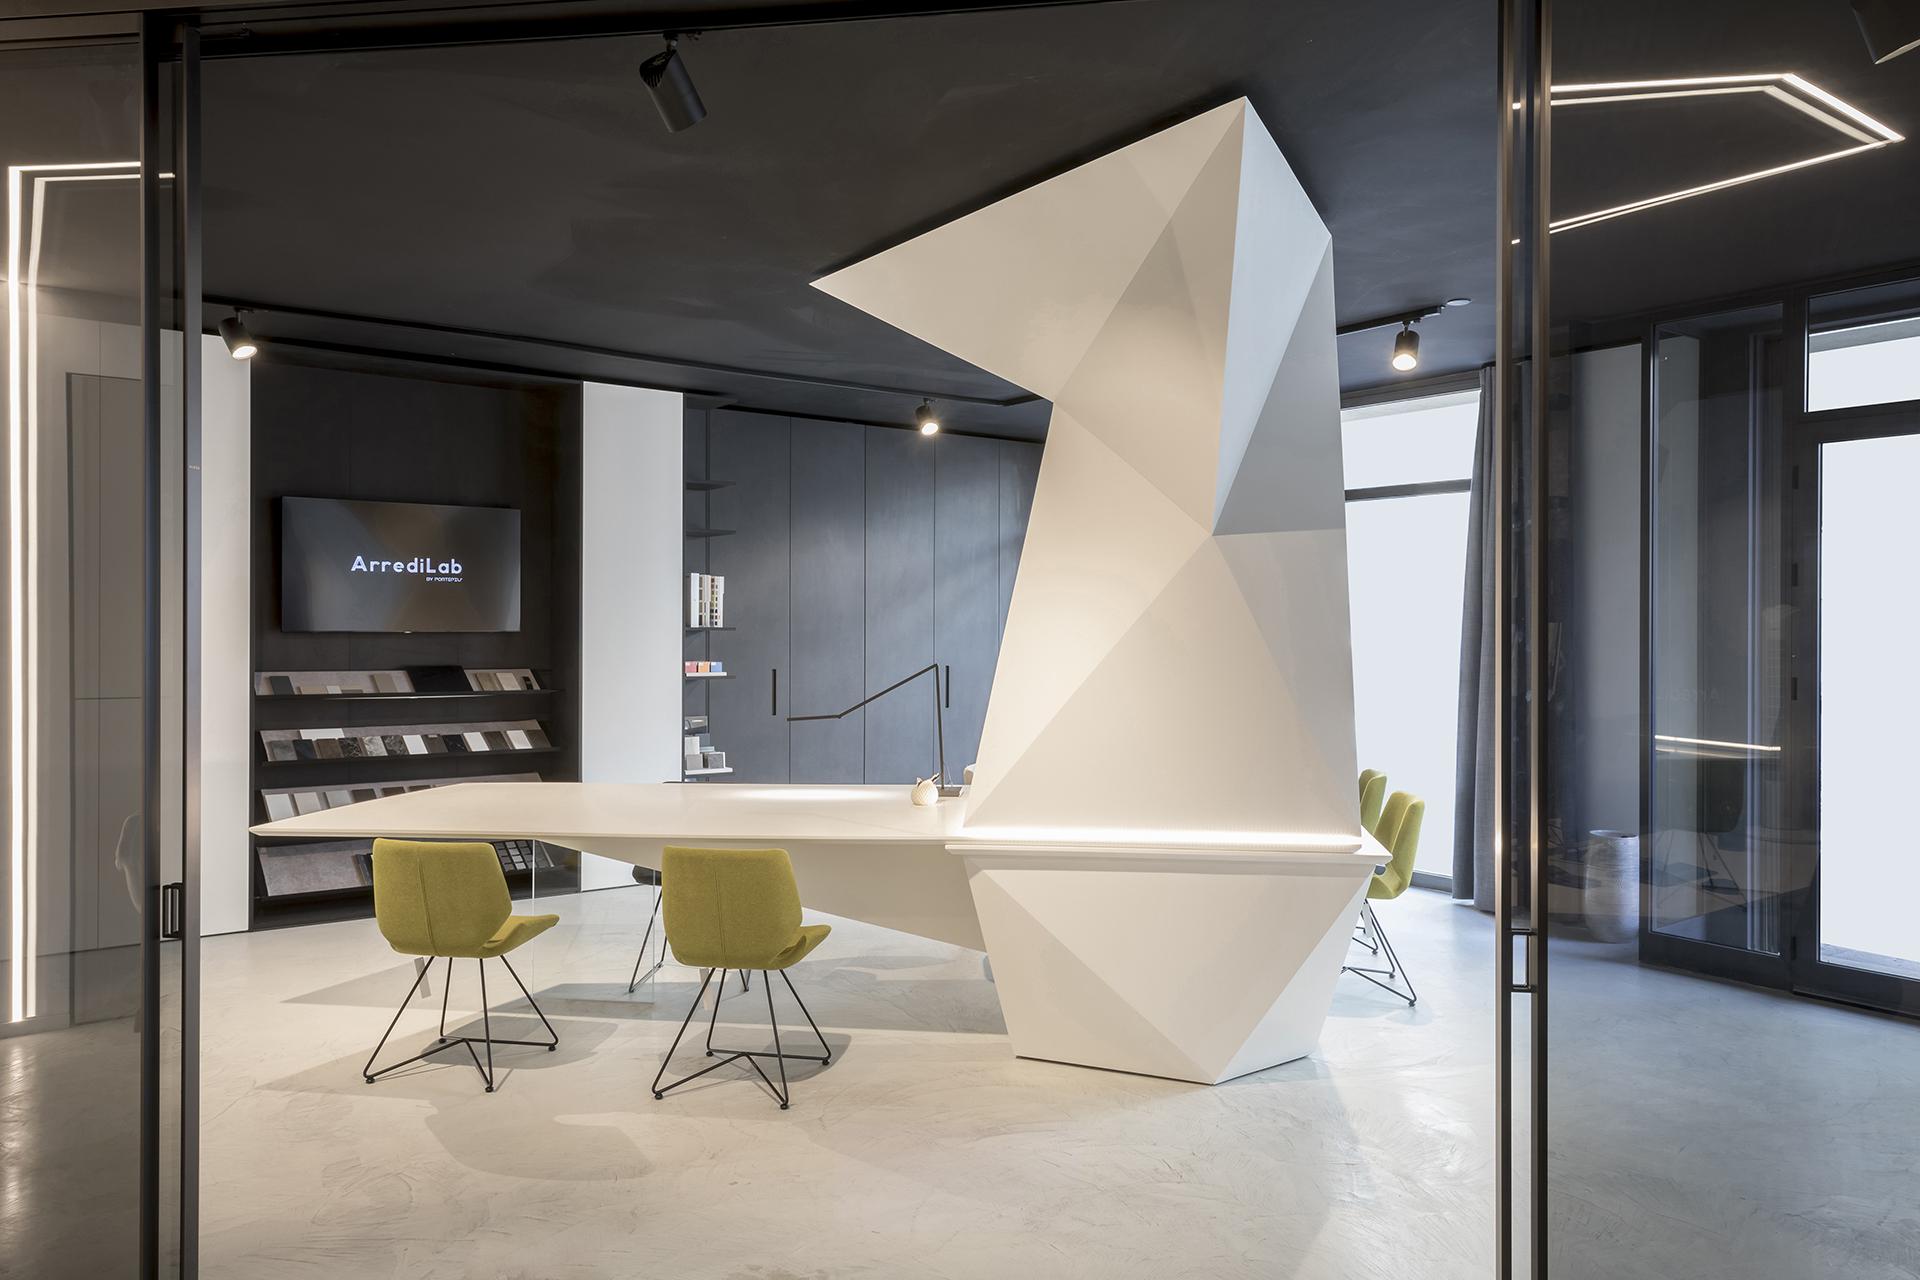 DFG-Architetti-Associati_showroom-Arredi-Lab-44